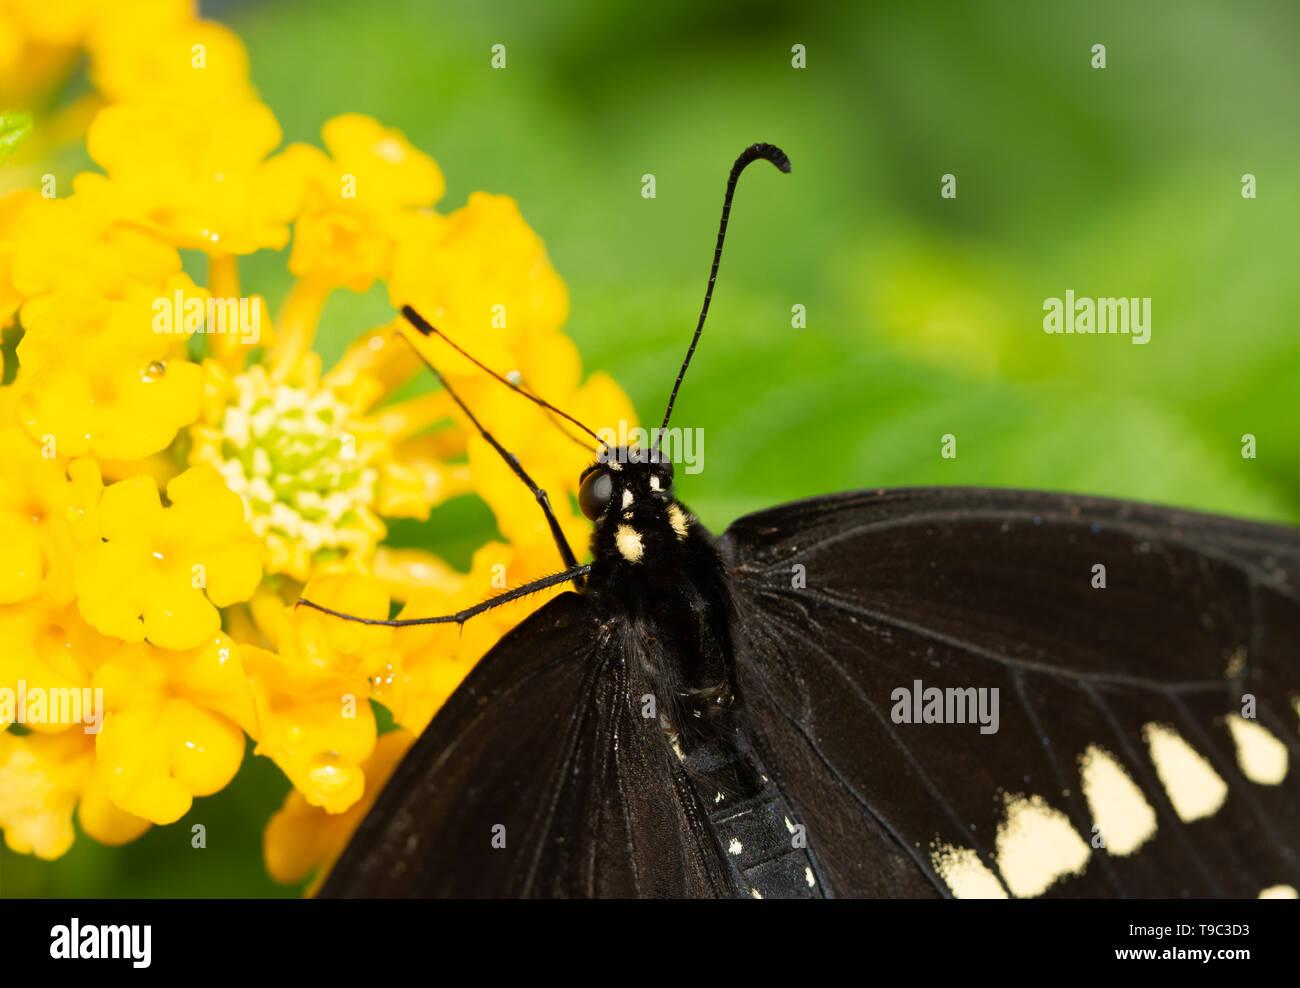 Closeup of a Black Swallowtail on a yellow Lantana flower - Stock Image